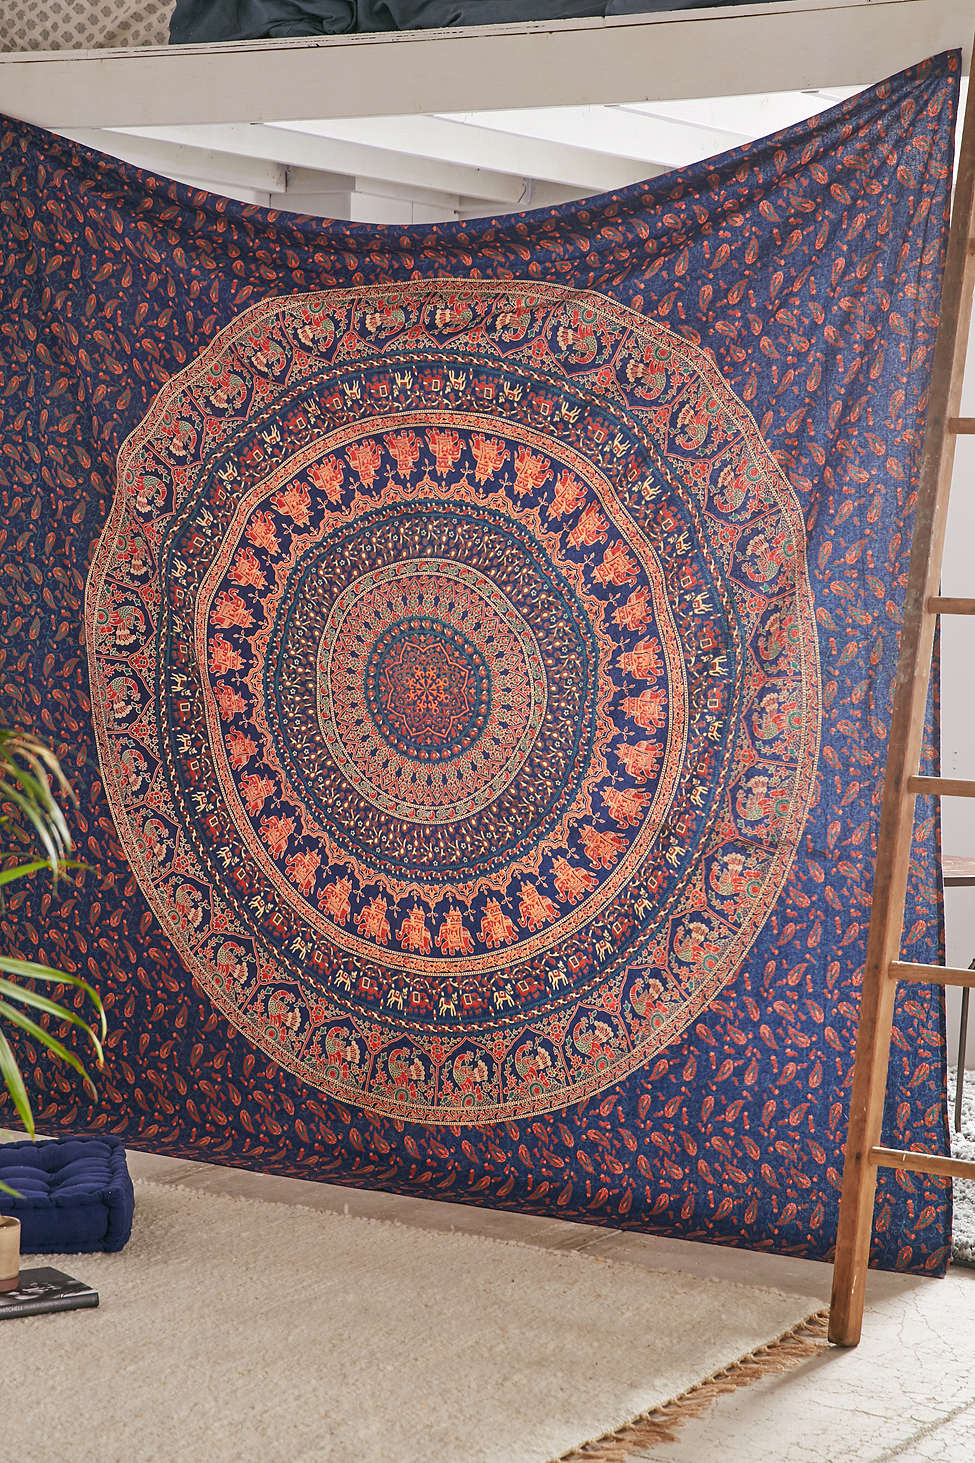 Indian Bohemian Mandala Tapestry Elephant Wall Hanging Hippie Bedspread Throw